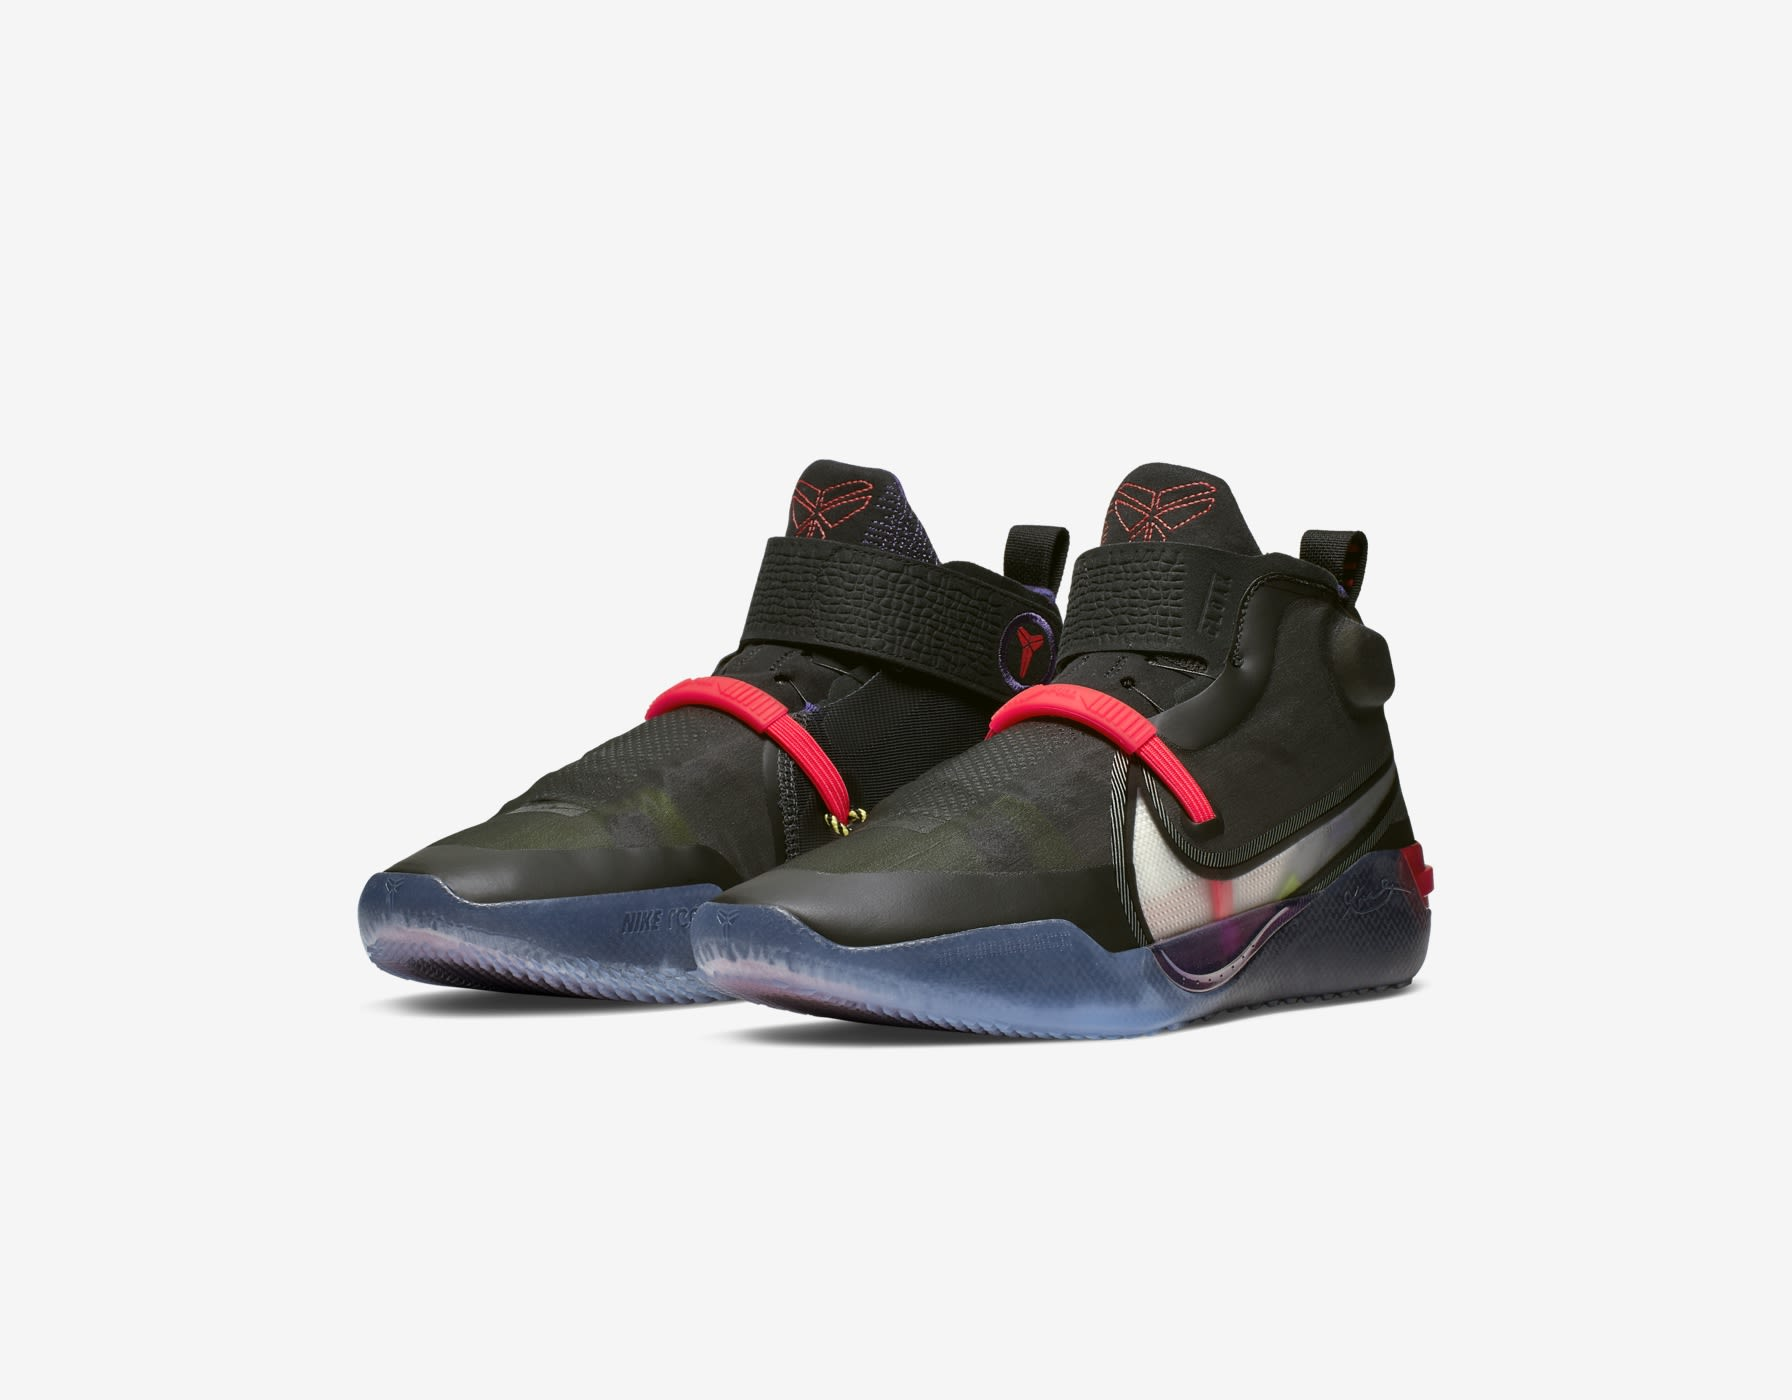 vente chaude en ligne 7066a 9fc82 Nike Basketball. Nike.com